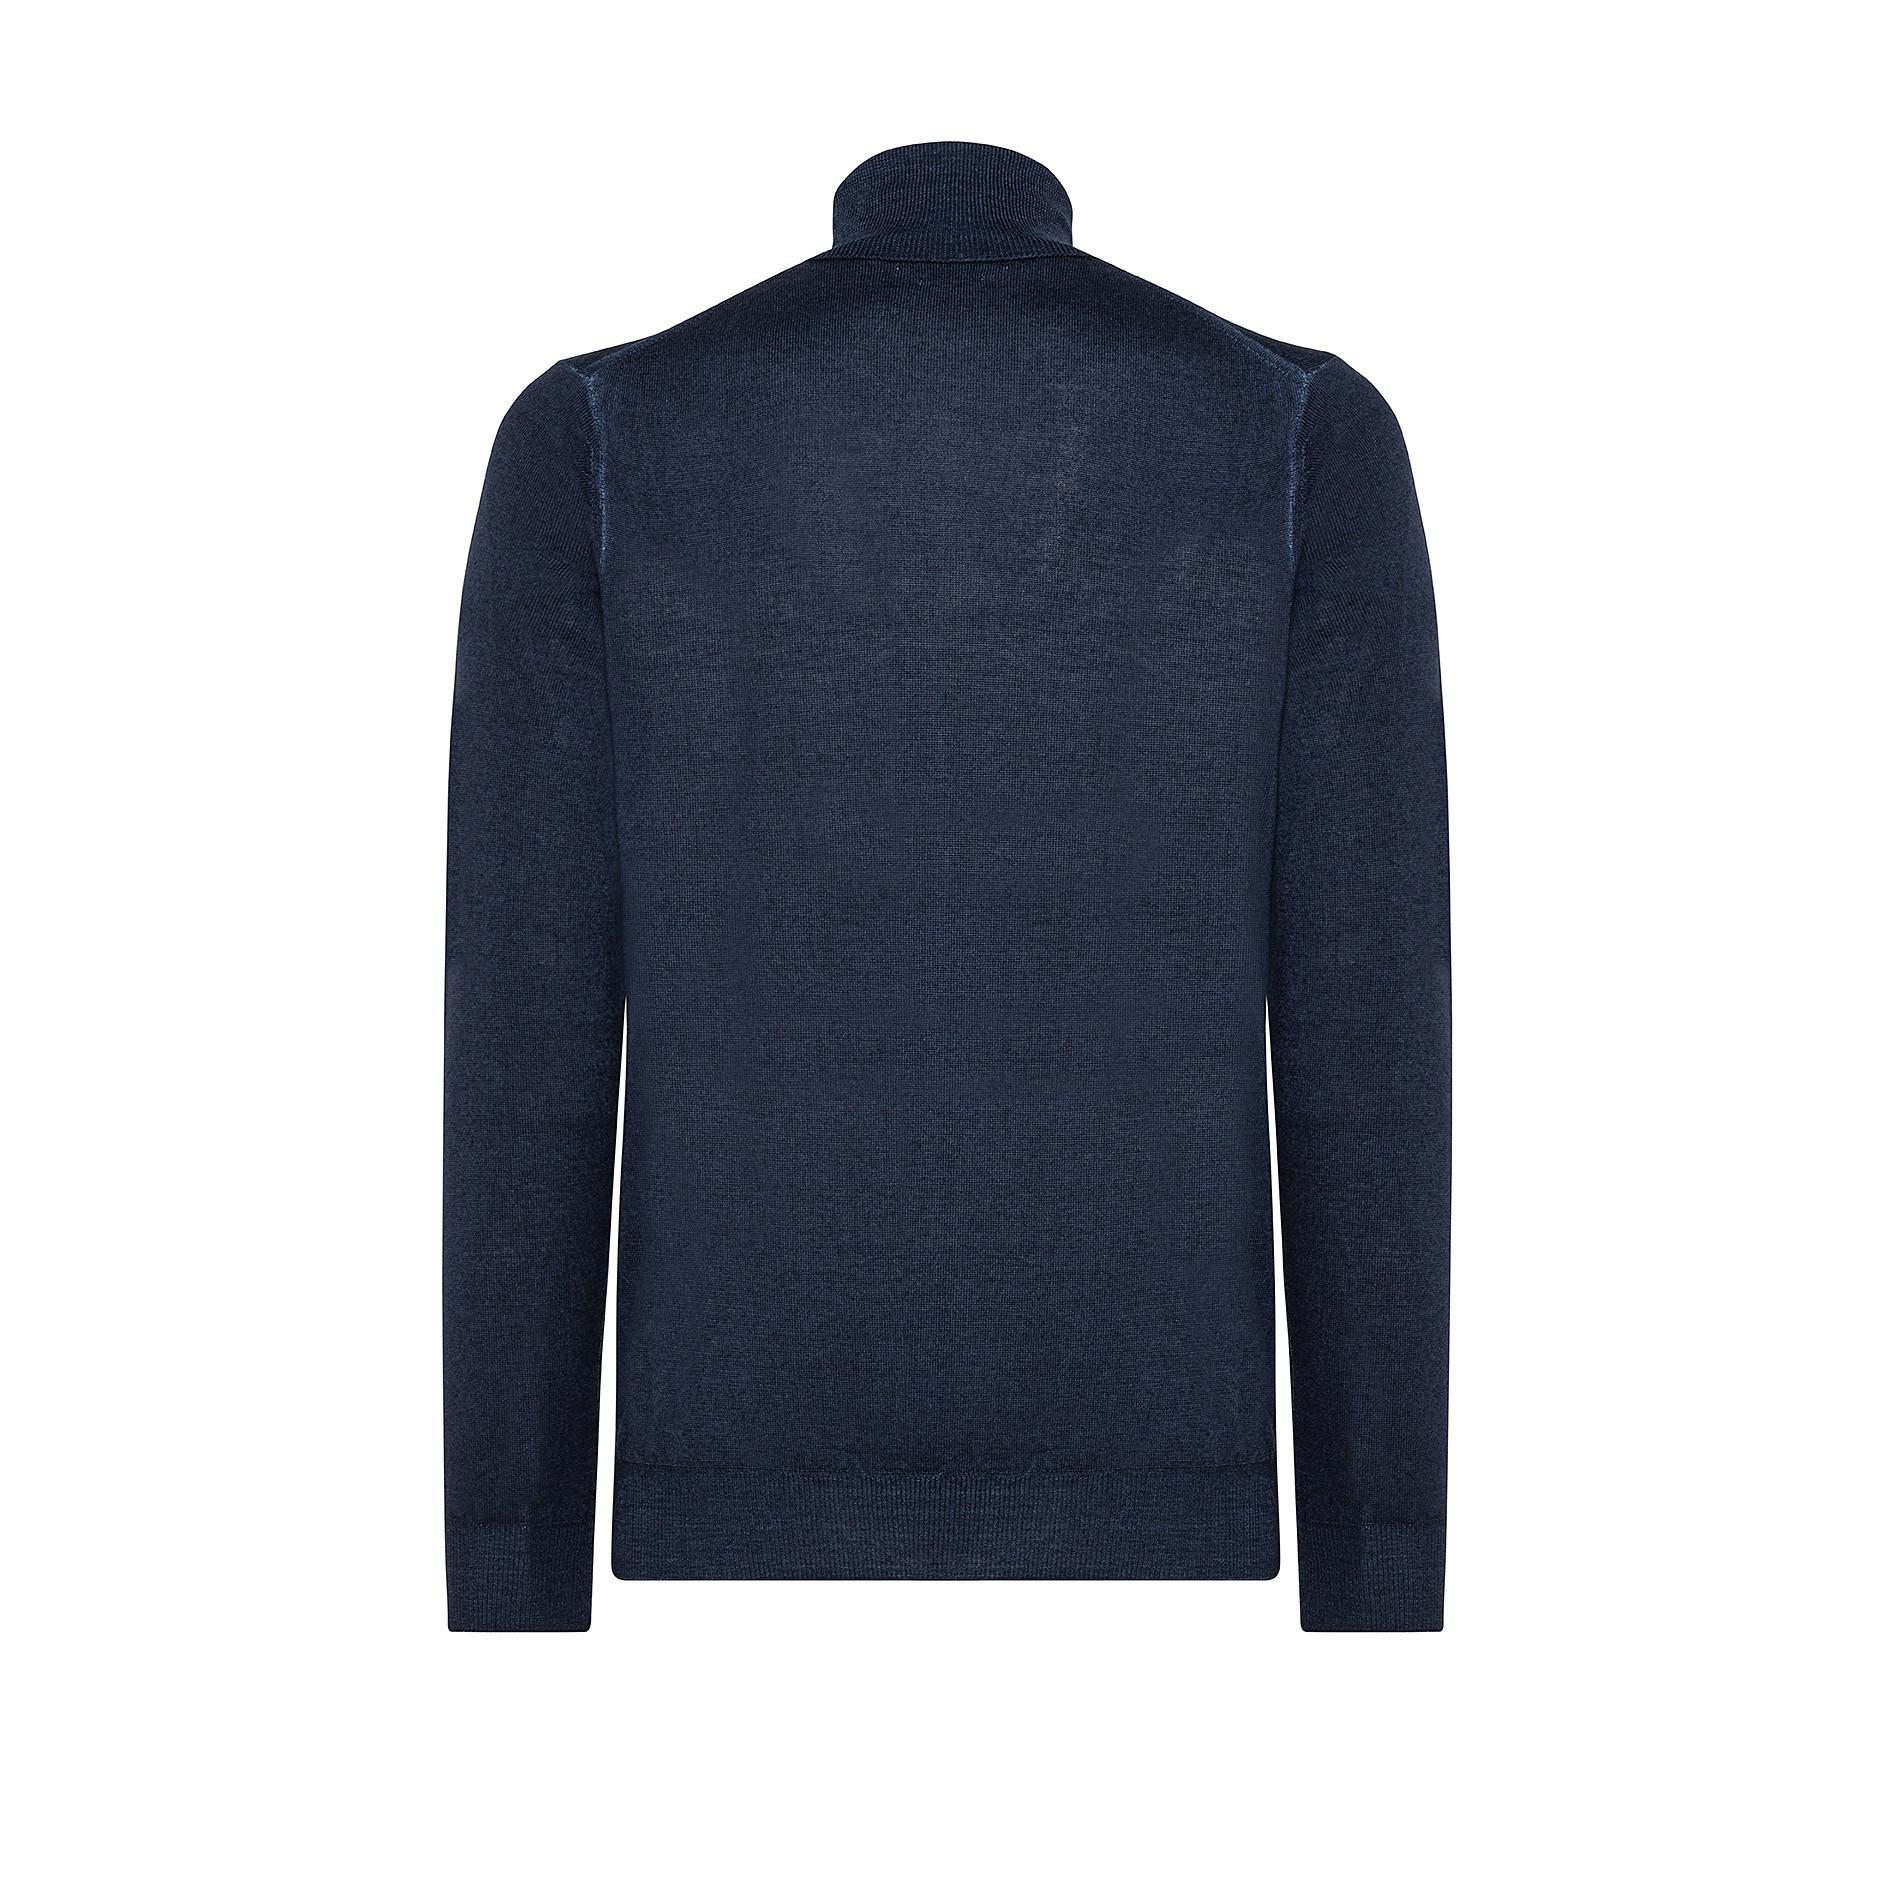 Pullover lana merinos collo alto, Blu, large image number 1